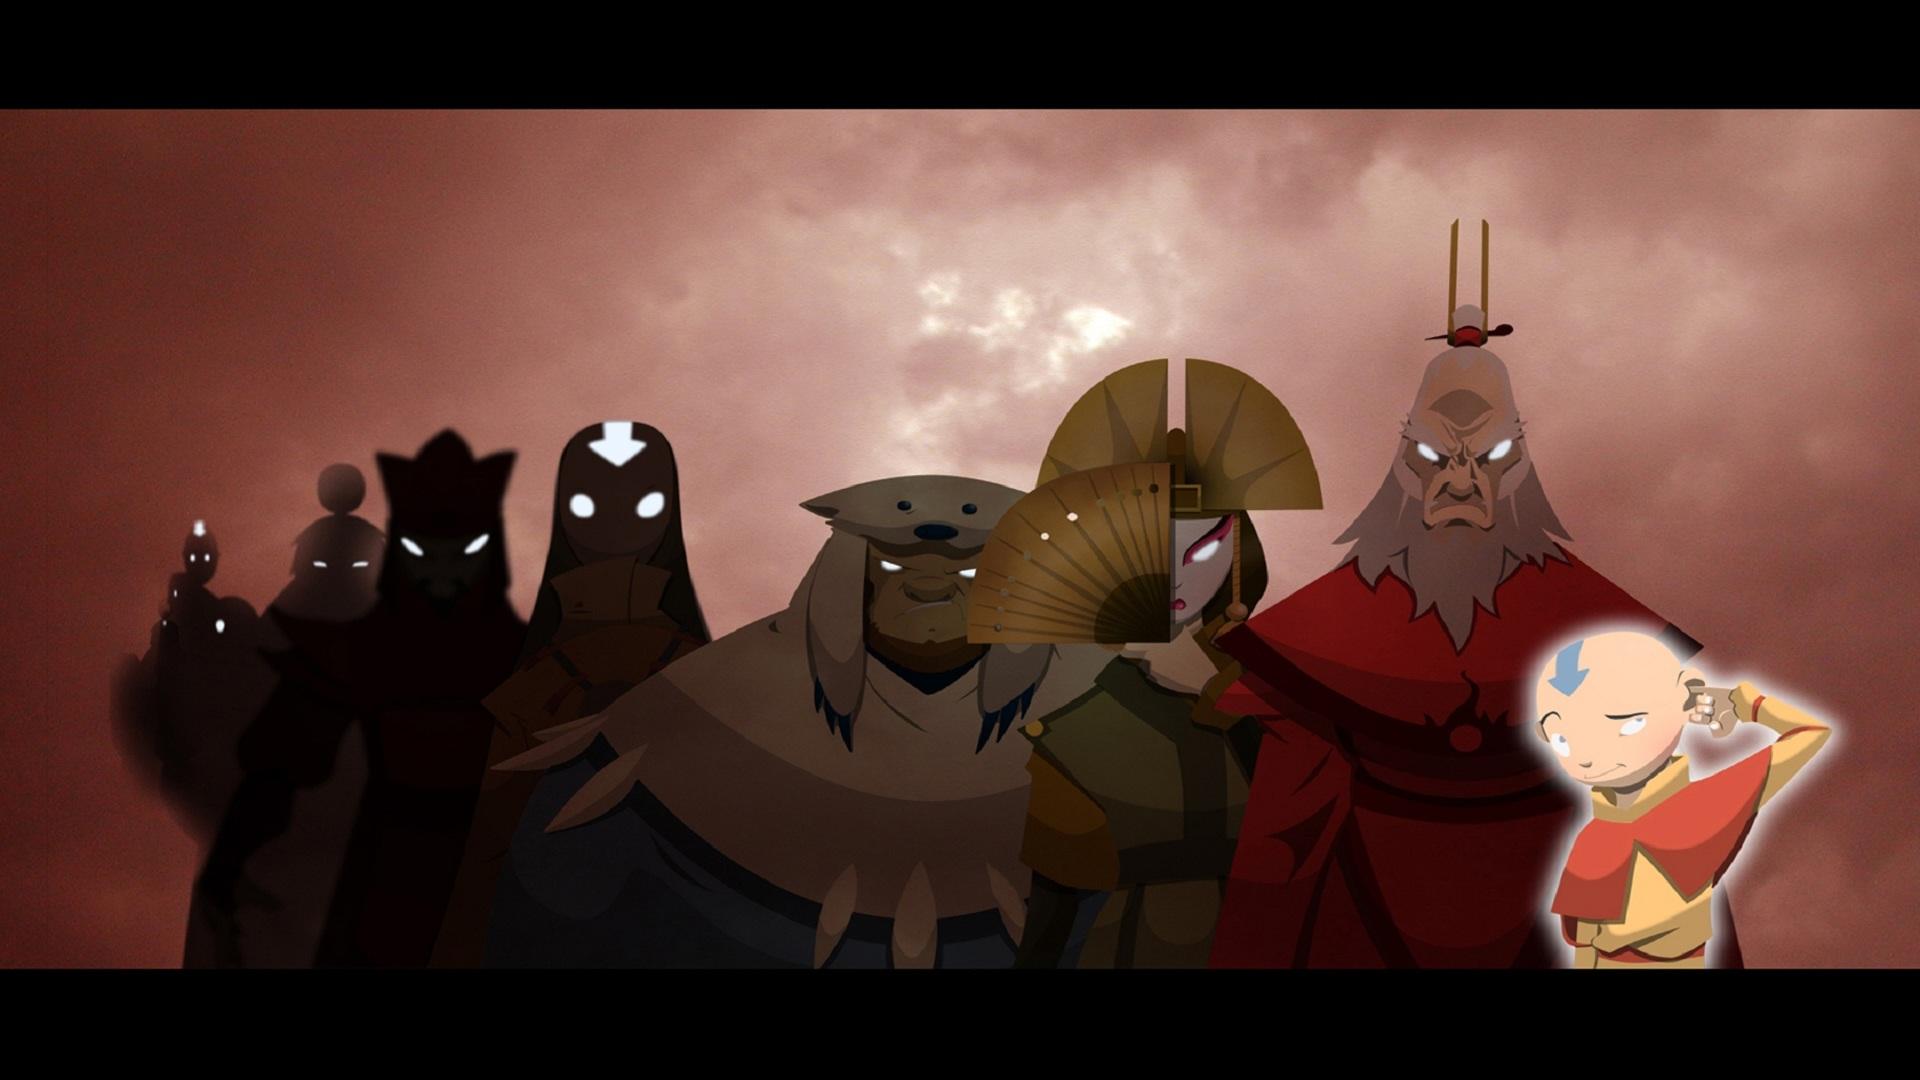 Avatar The Last Airbender Aang Free Wallpaper Wallpaperjam Com